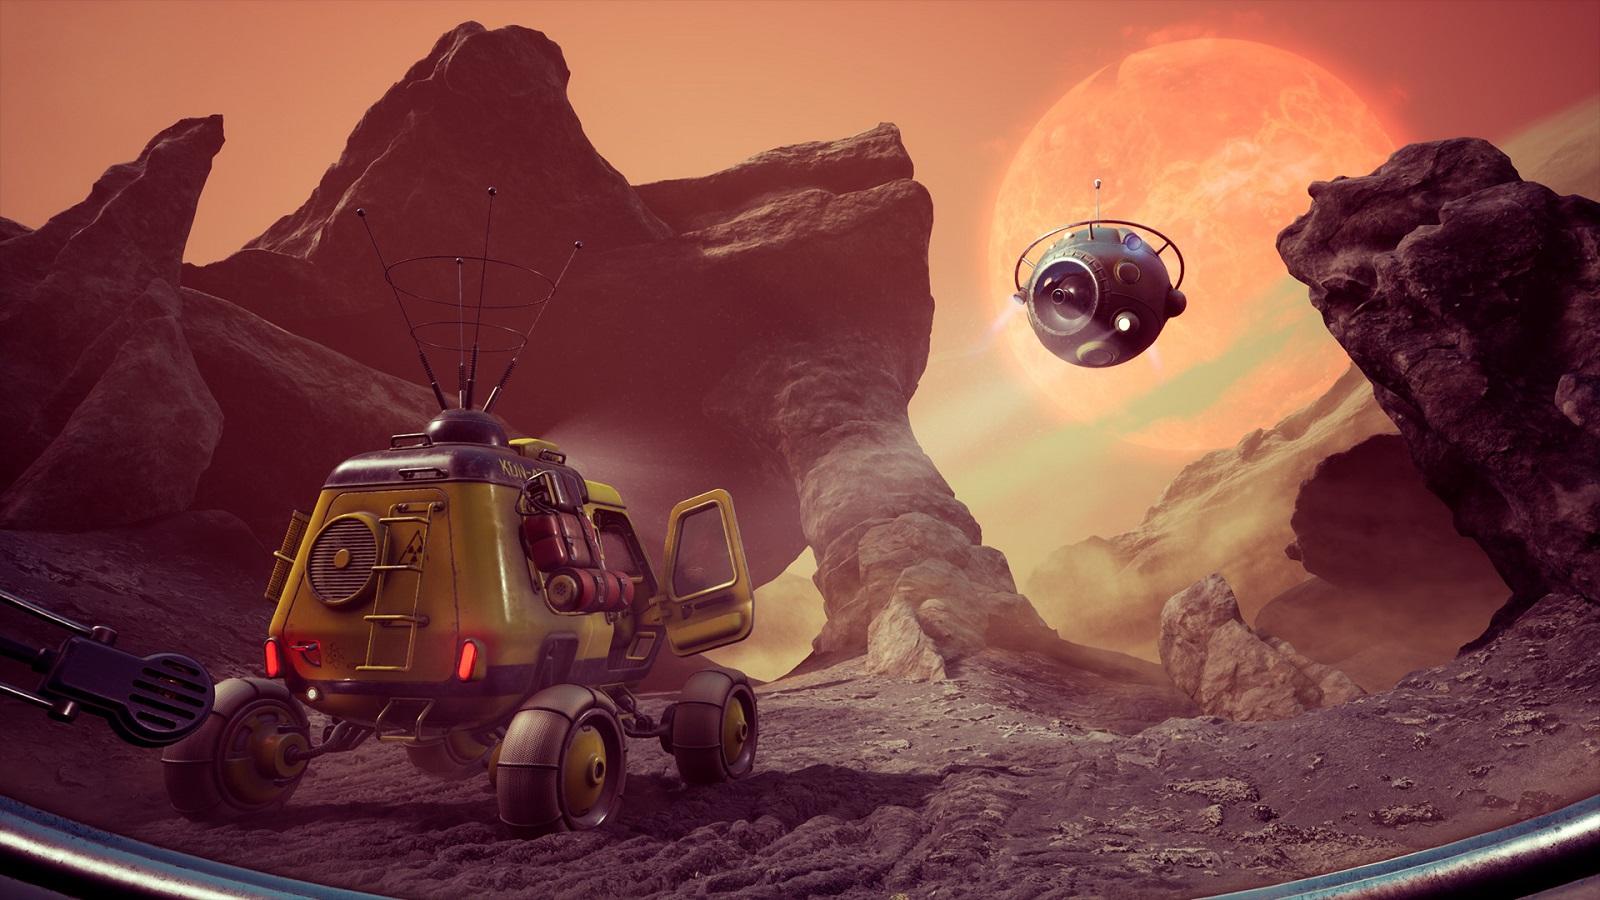 Бывшие сотрудники CD Projekt RED и Techland анонсировали приключение The Invincible по роману Станислава Лема - 06